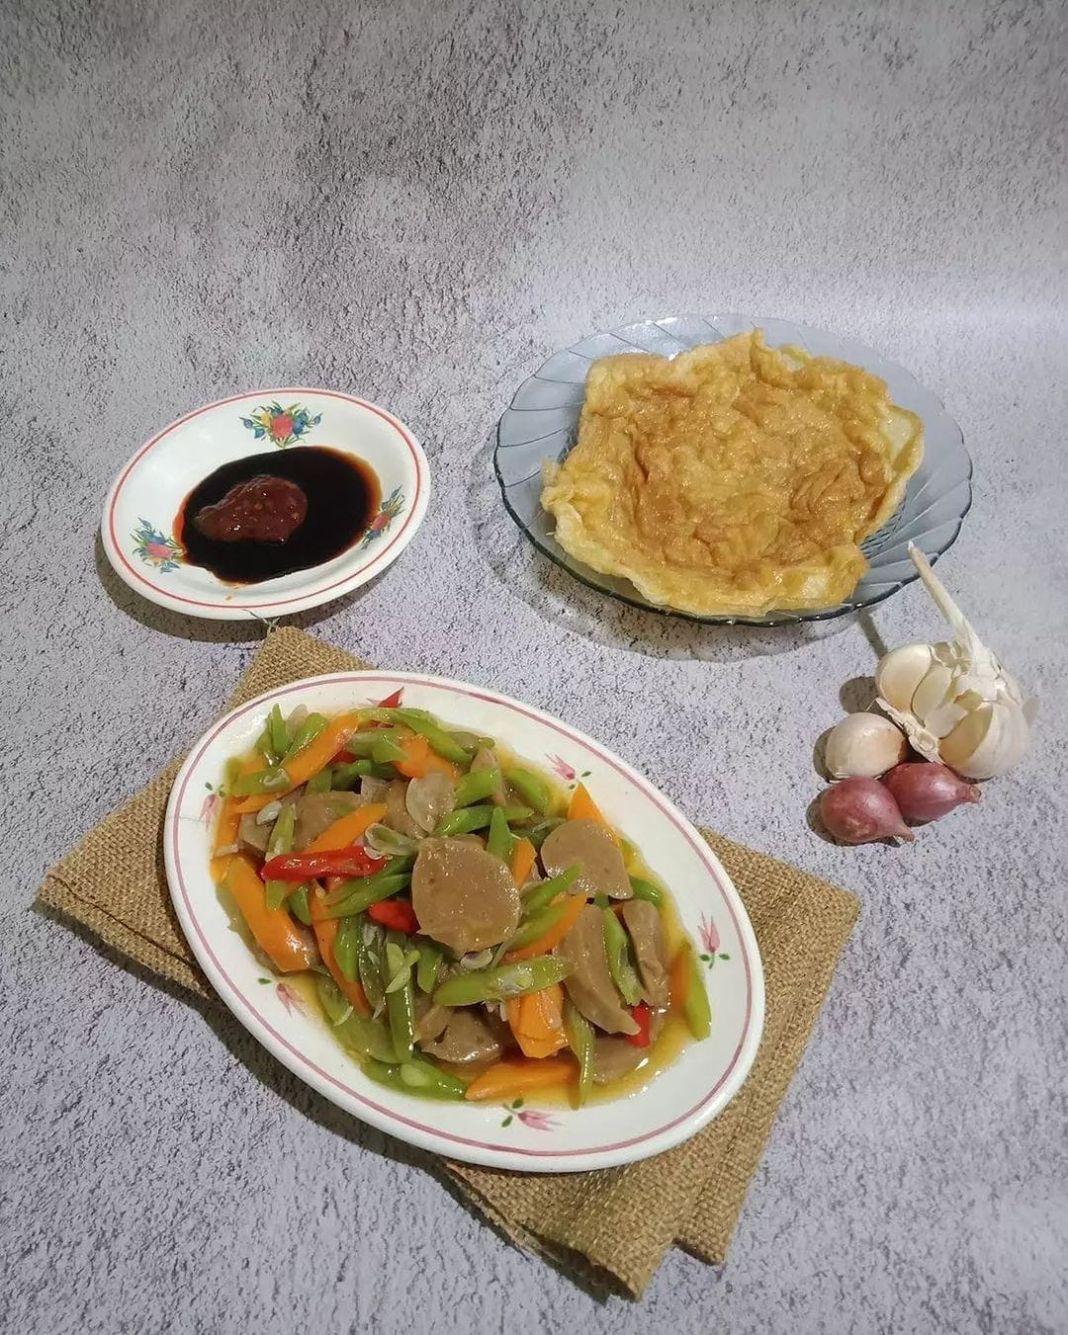 Info kuliner, tumis tumisan yg gampang bgt untuk nyaa!   Tumis buncis wortel bakso Bahan-bahan: Wortel 1bj Bun…